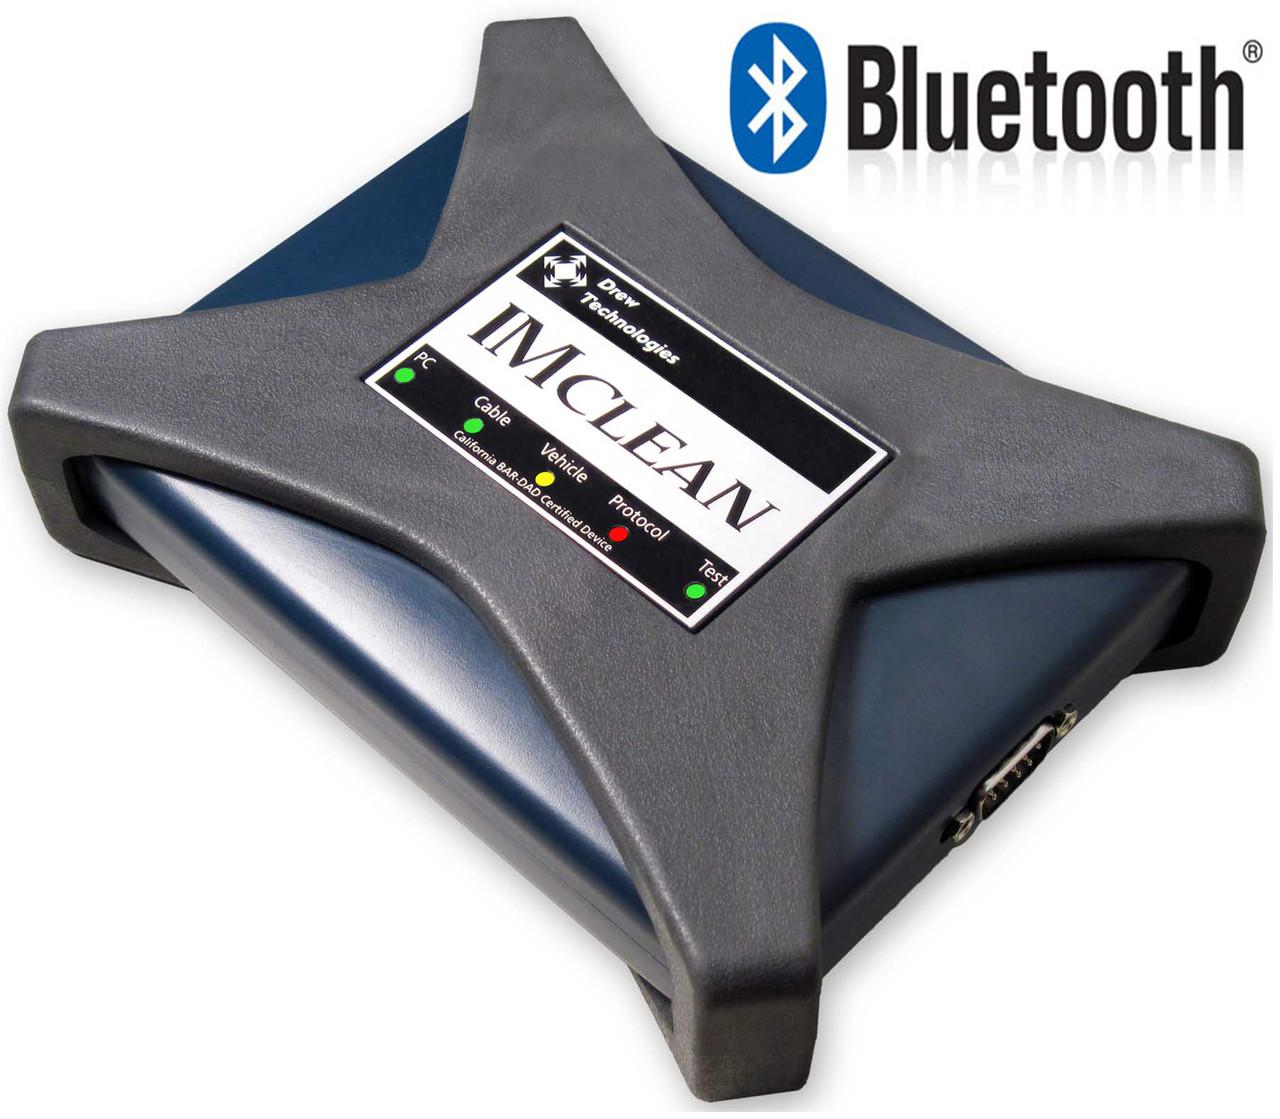 Imclean Wireless Bar Ois Dad Unit By Drew Technologies